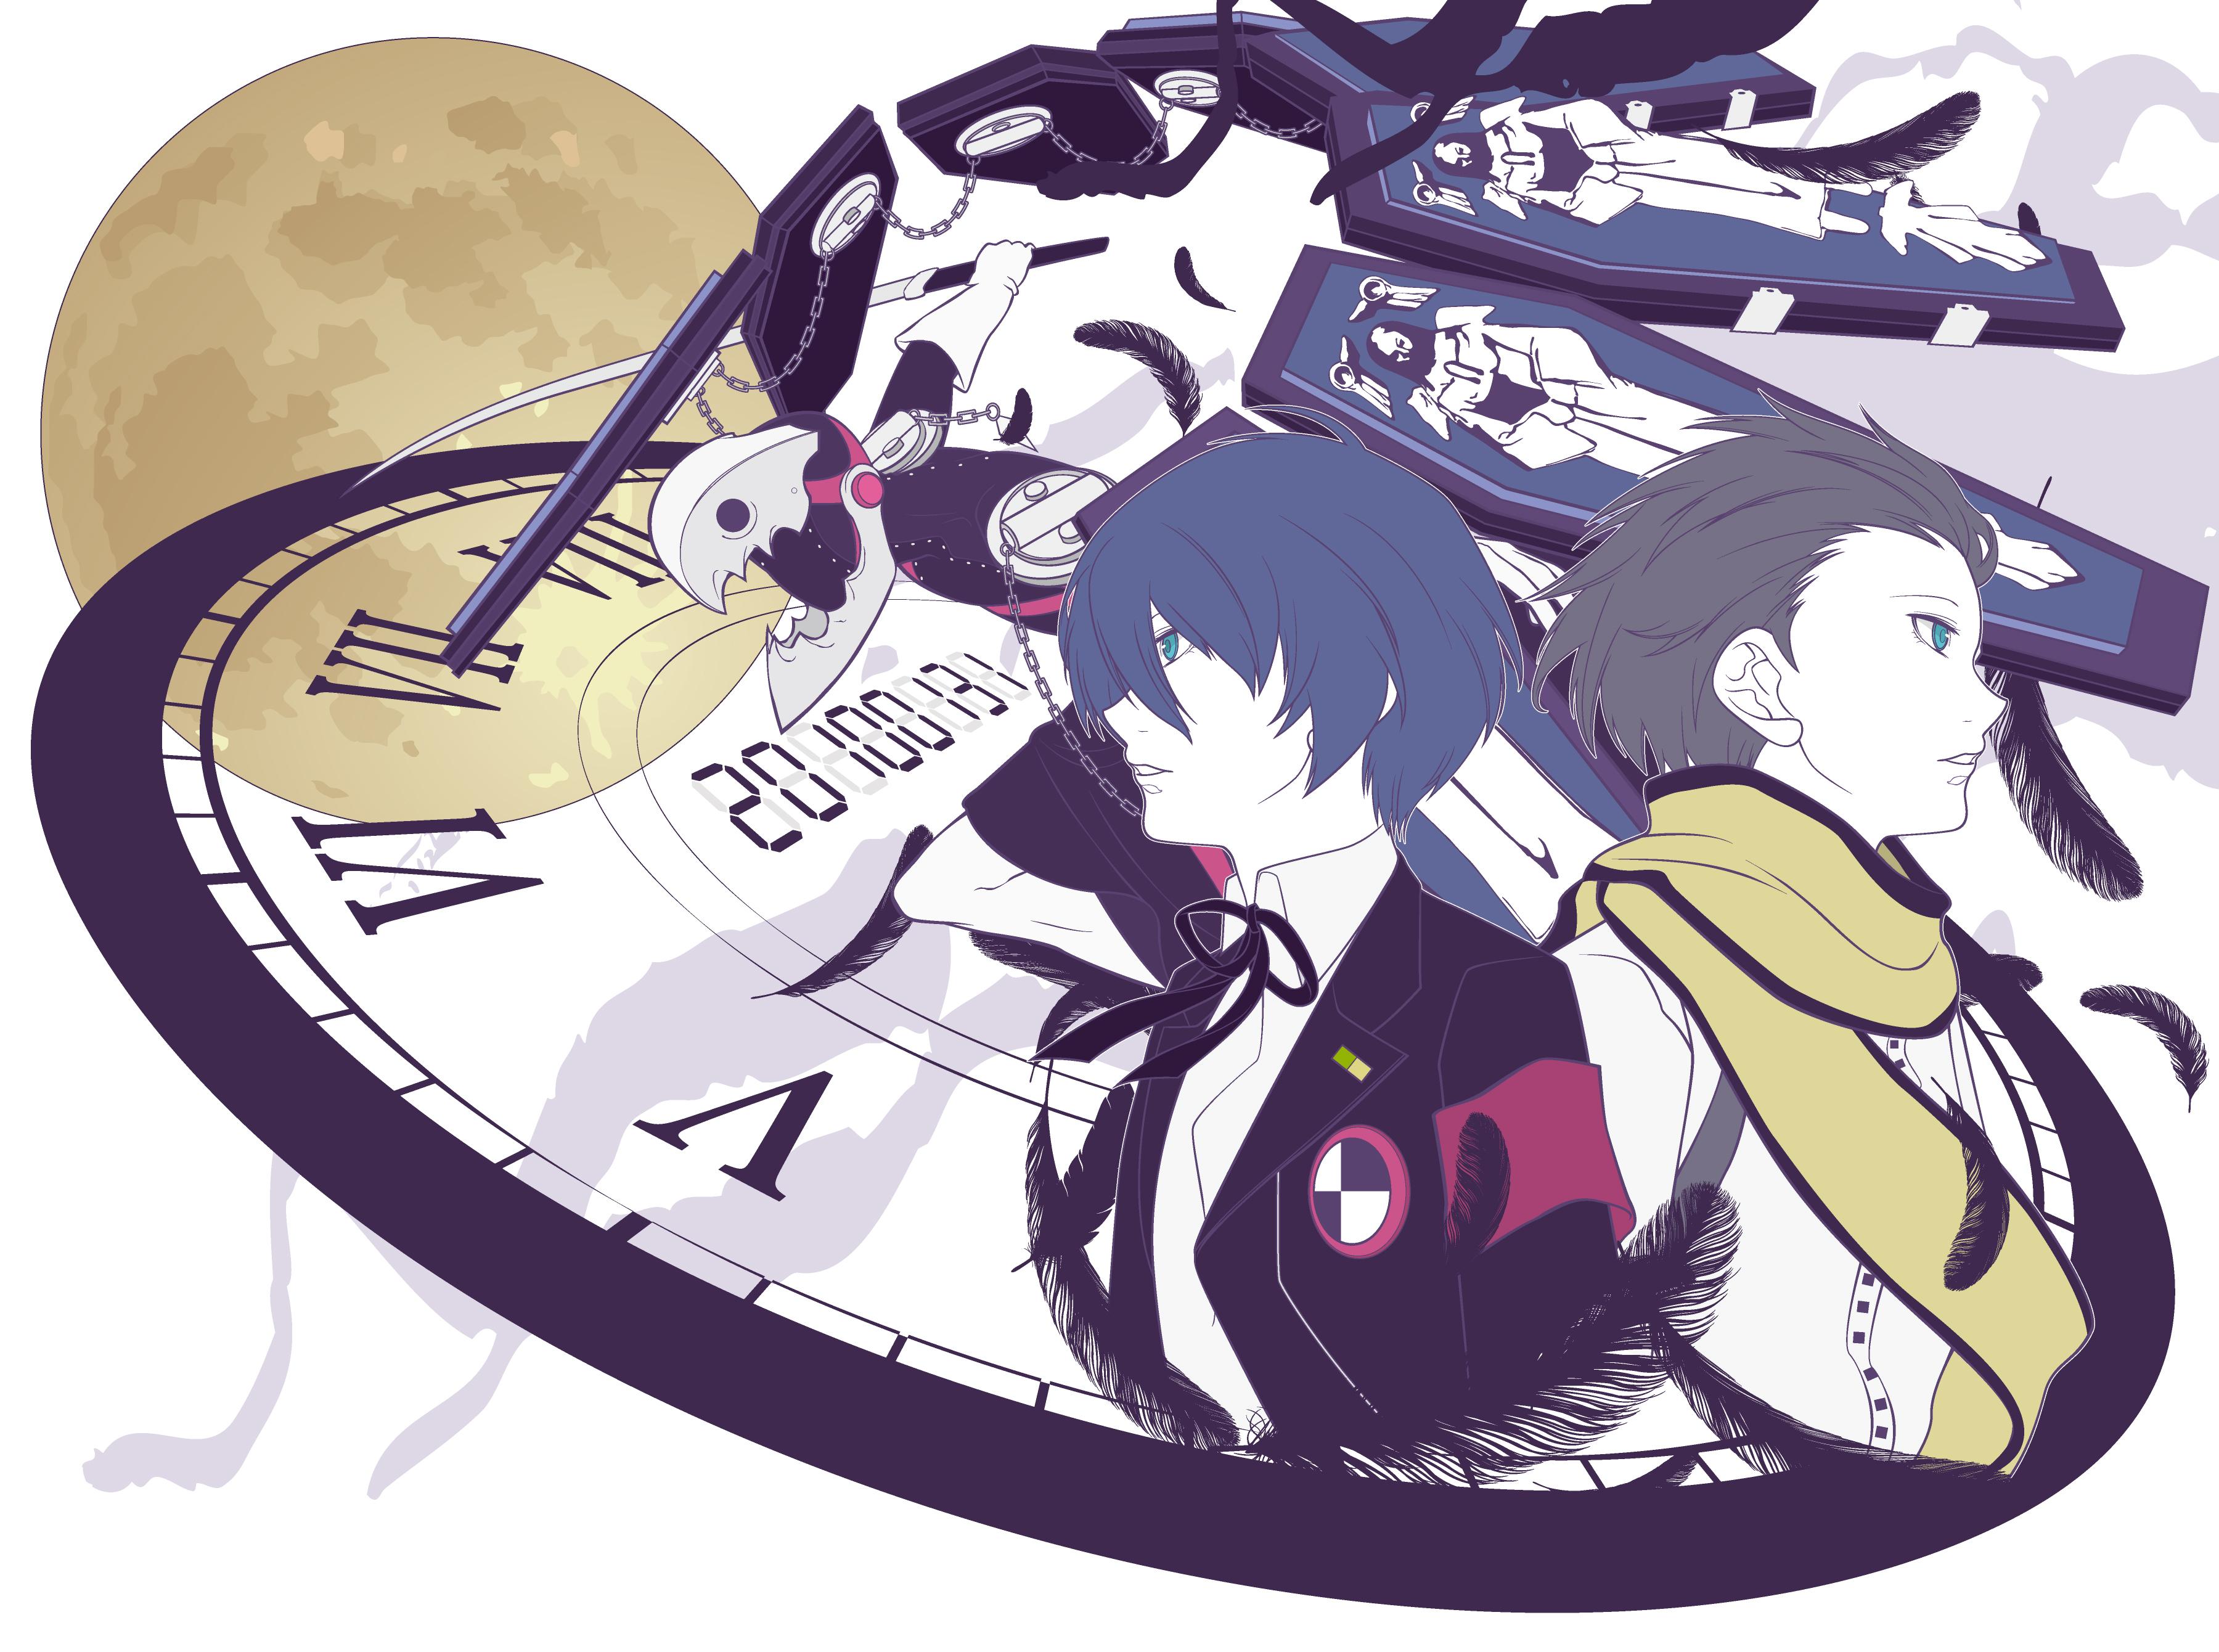 Wallpaper Persona 3 Shin Megami Tensei Series Video Game